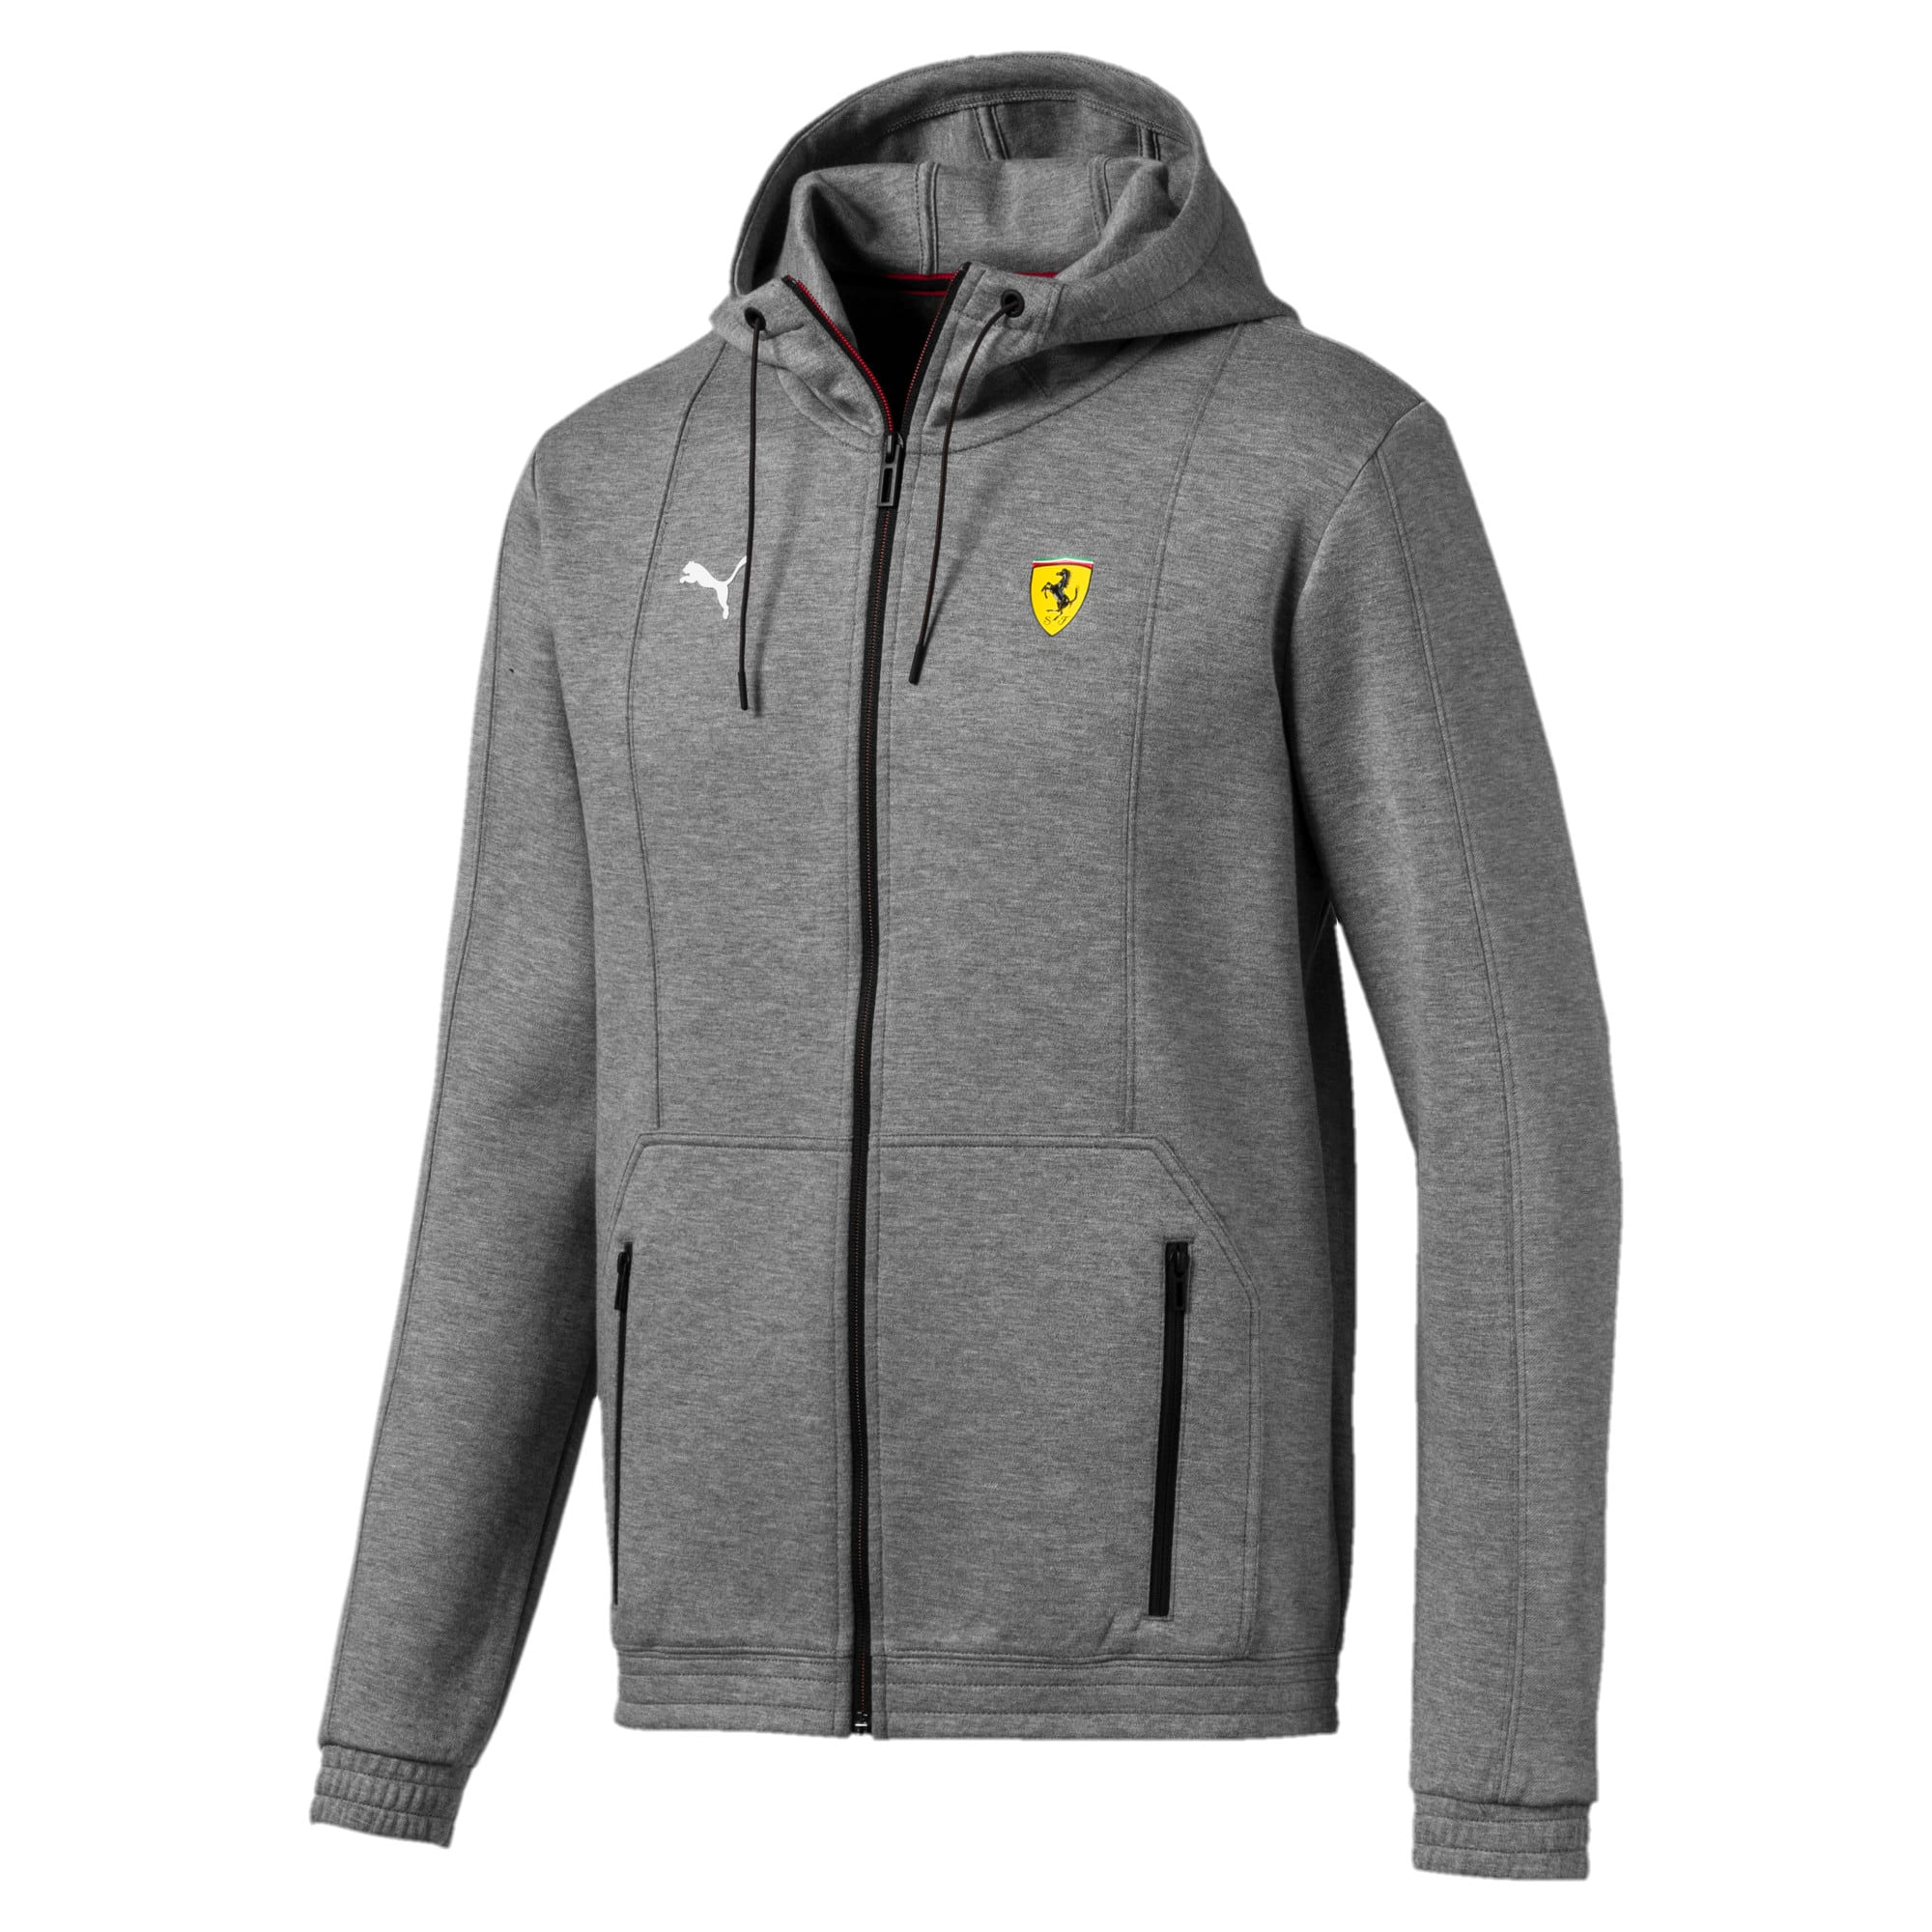 Thumbnail 5 of Ferrari Hooded Men's Sweat Jacket, Medium Gray Heather, medium